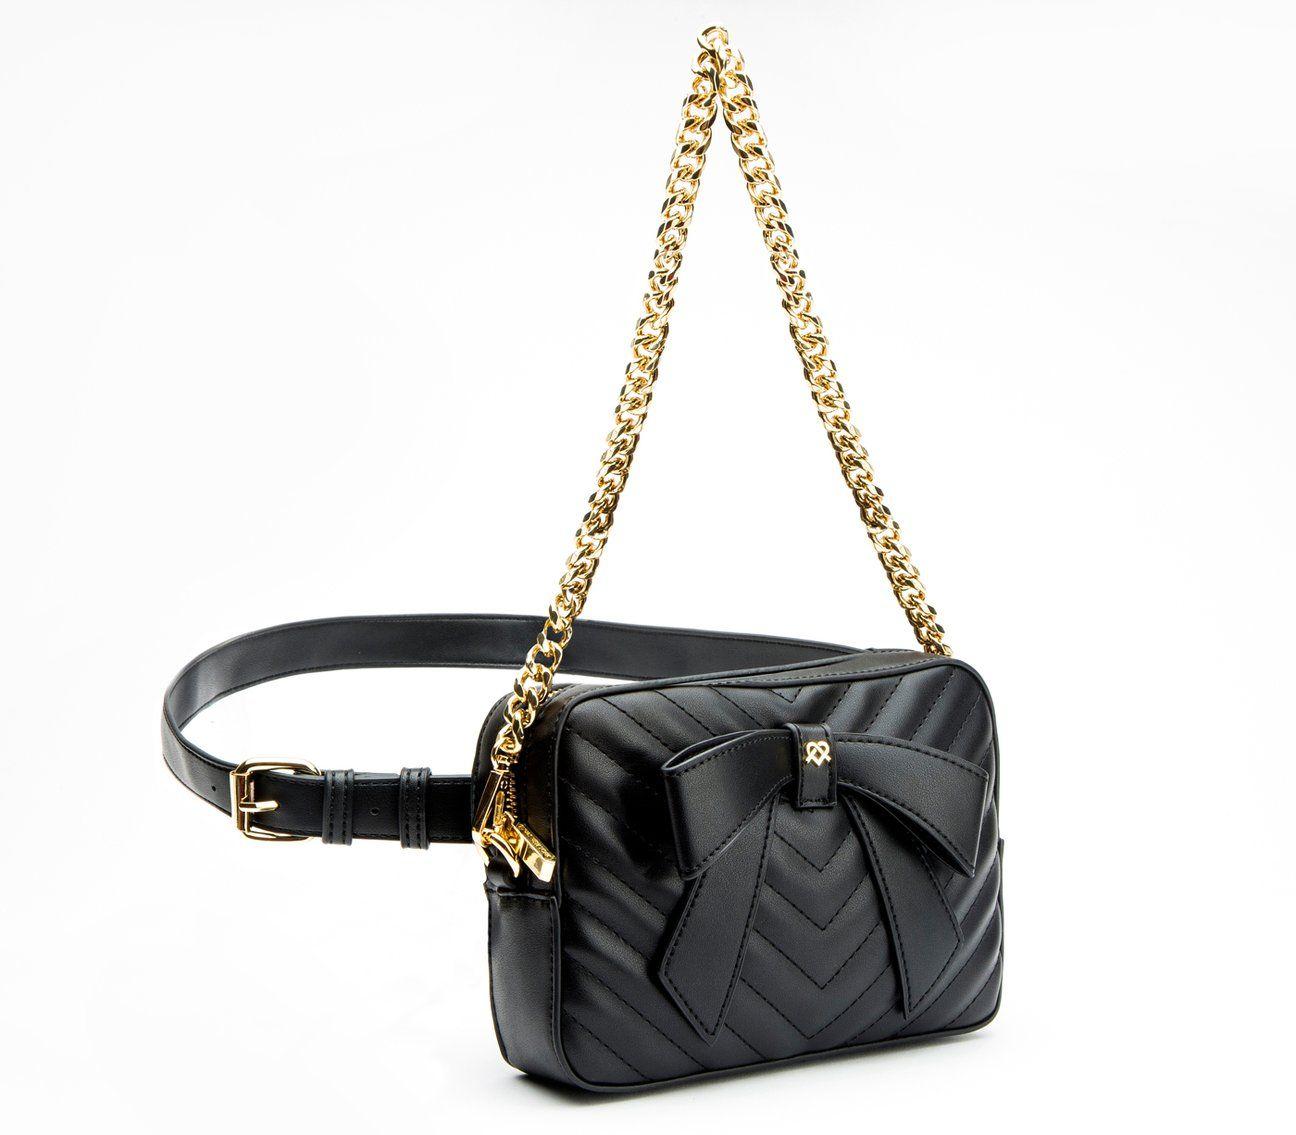 Chloe Vegan Leather Bag Vegan Leather Leather Bag